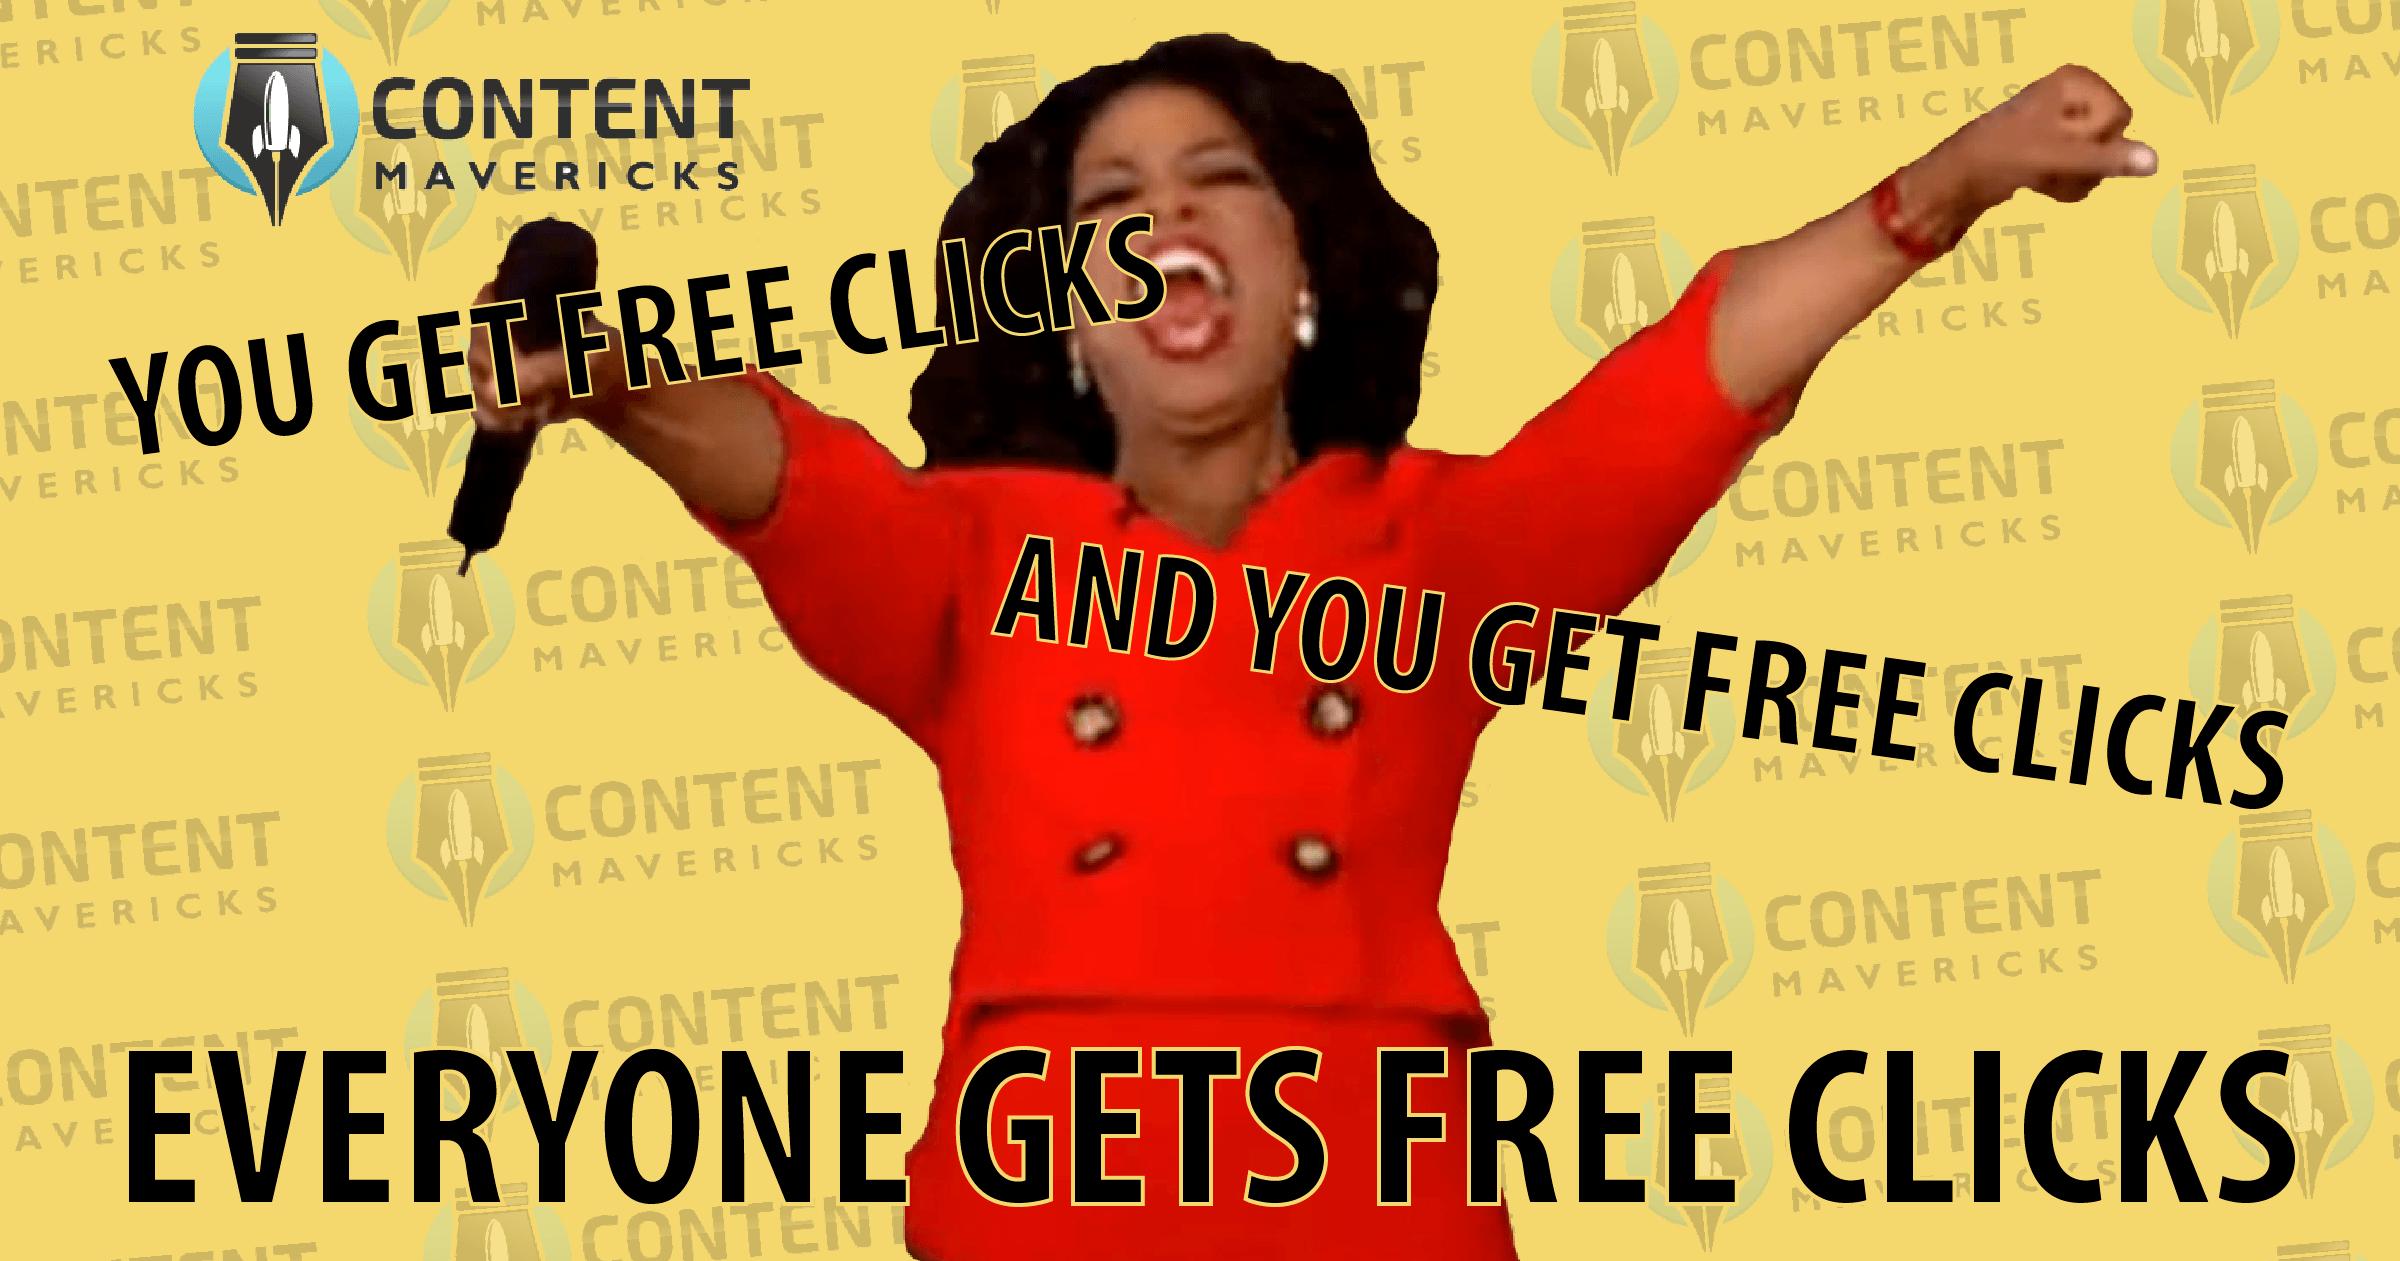 content marketing case studies featured image